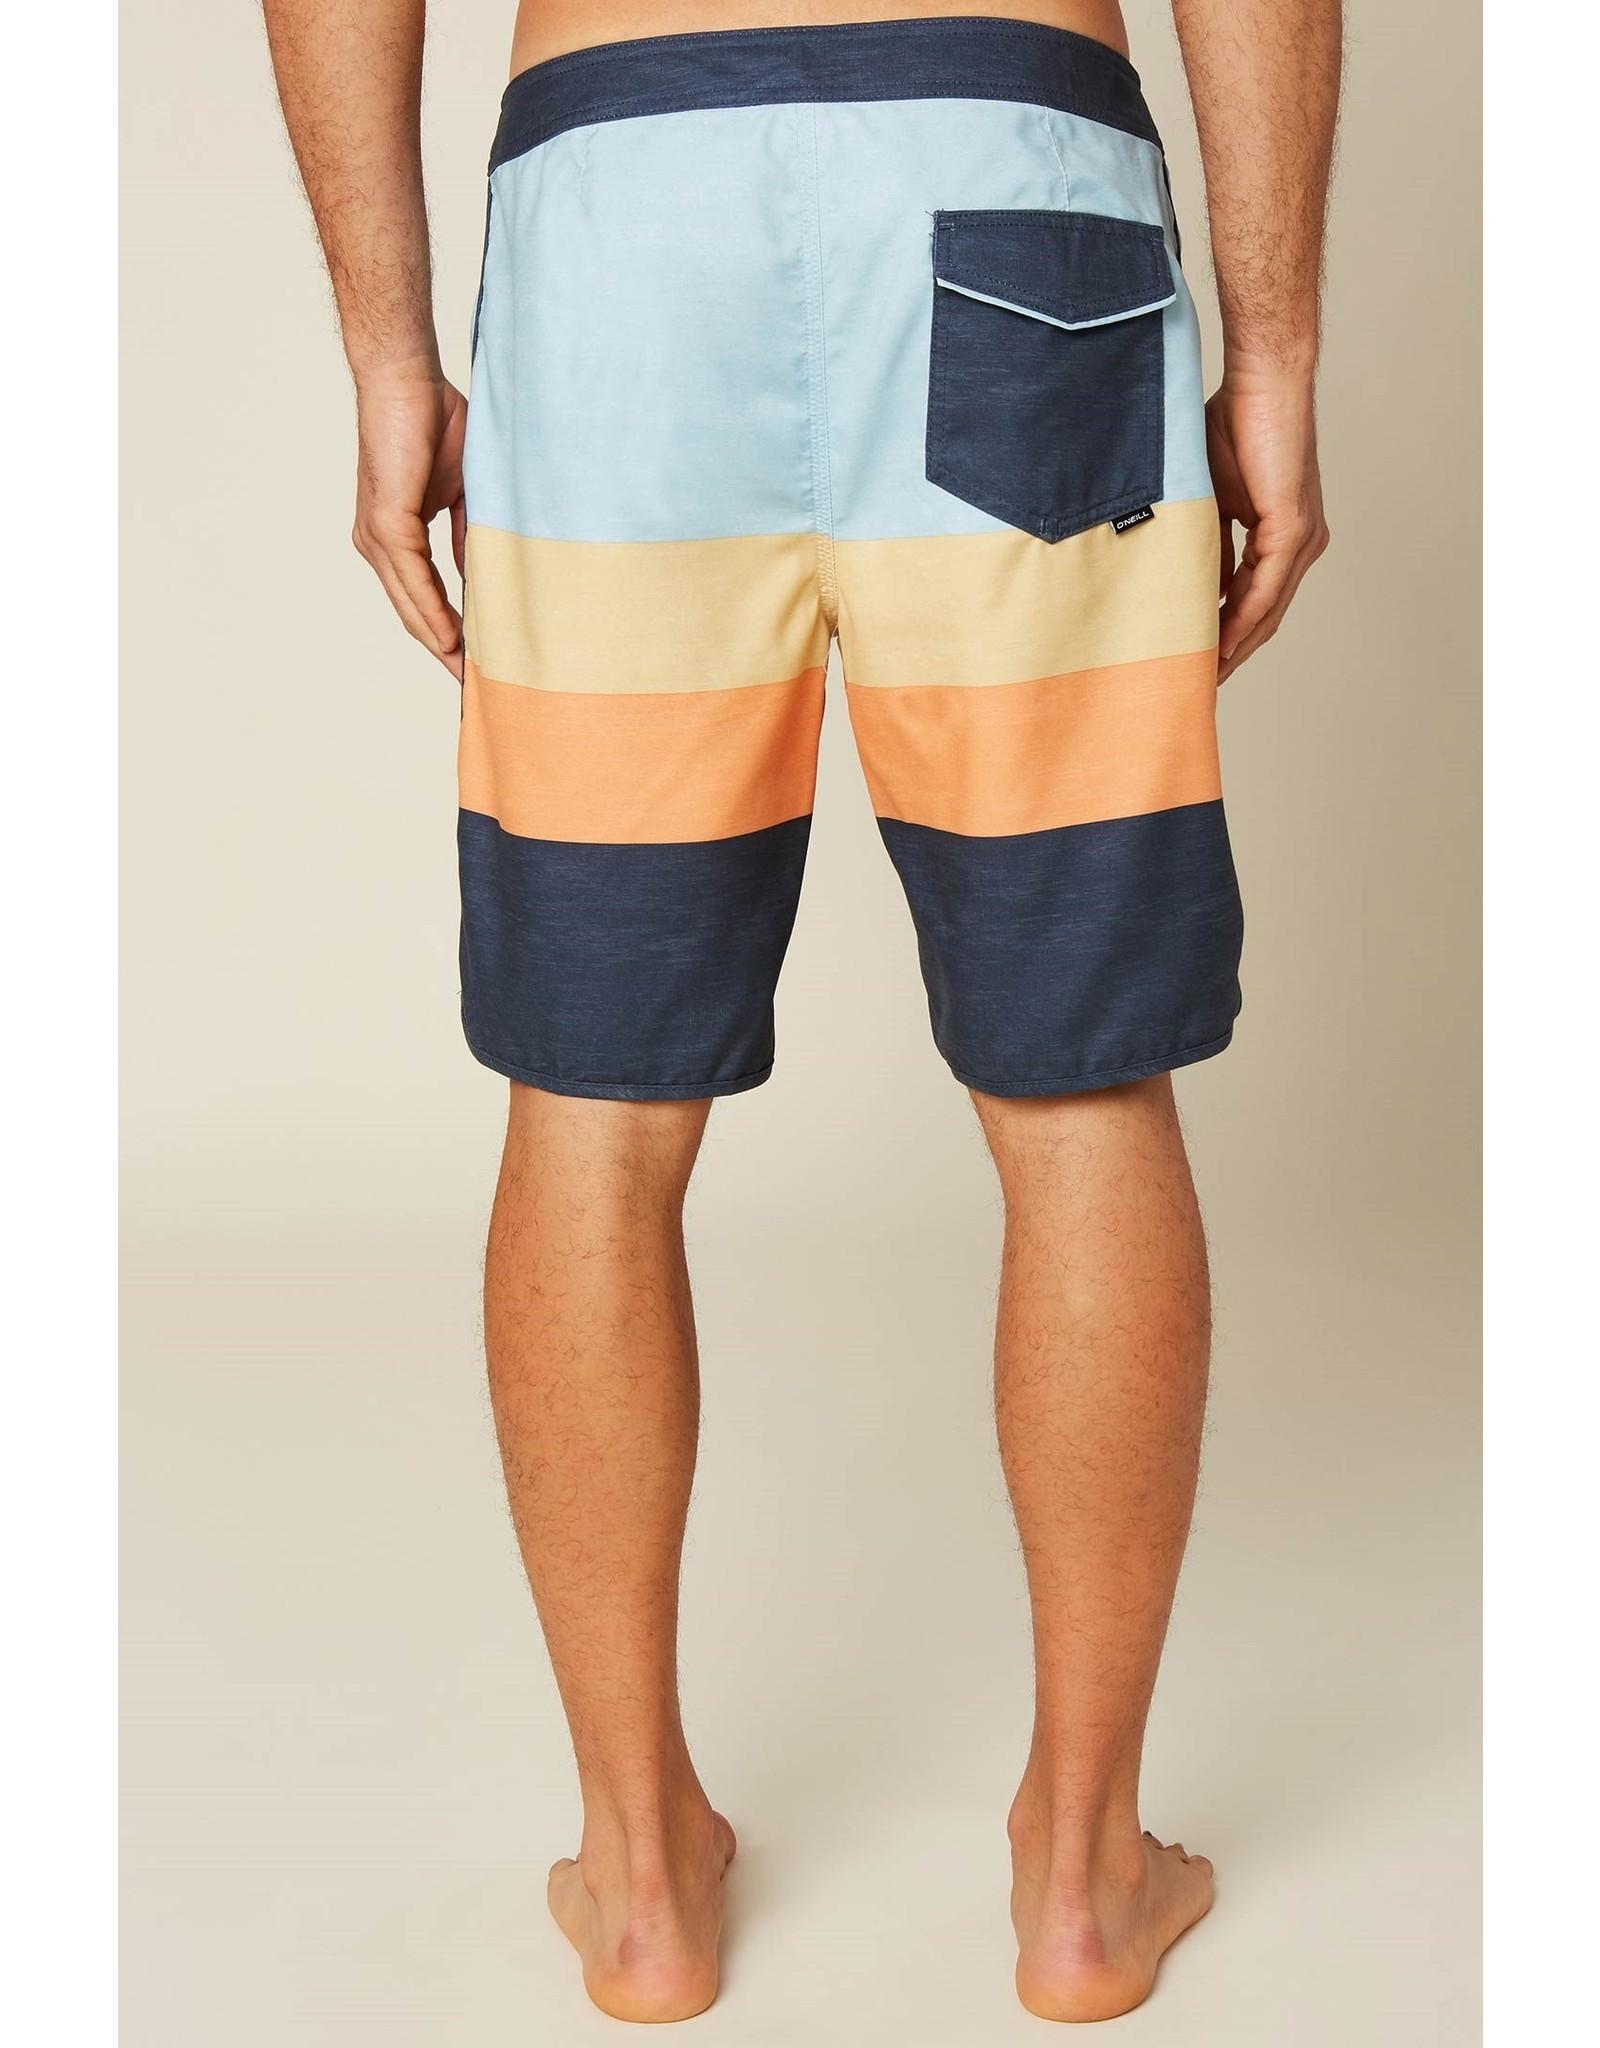 O'niell Four Square Shorts